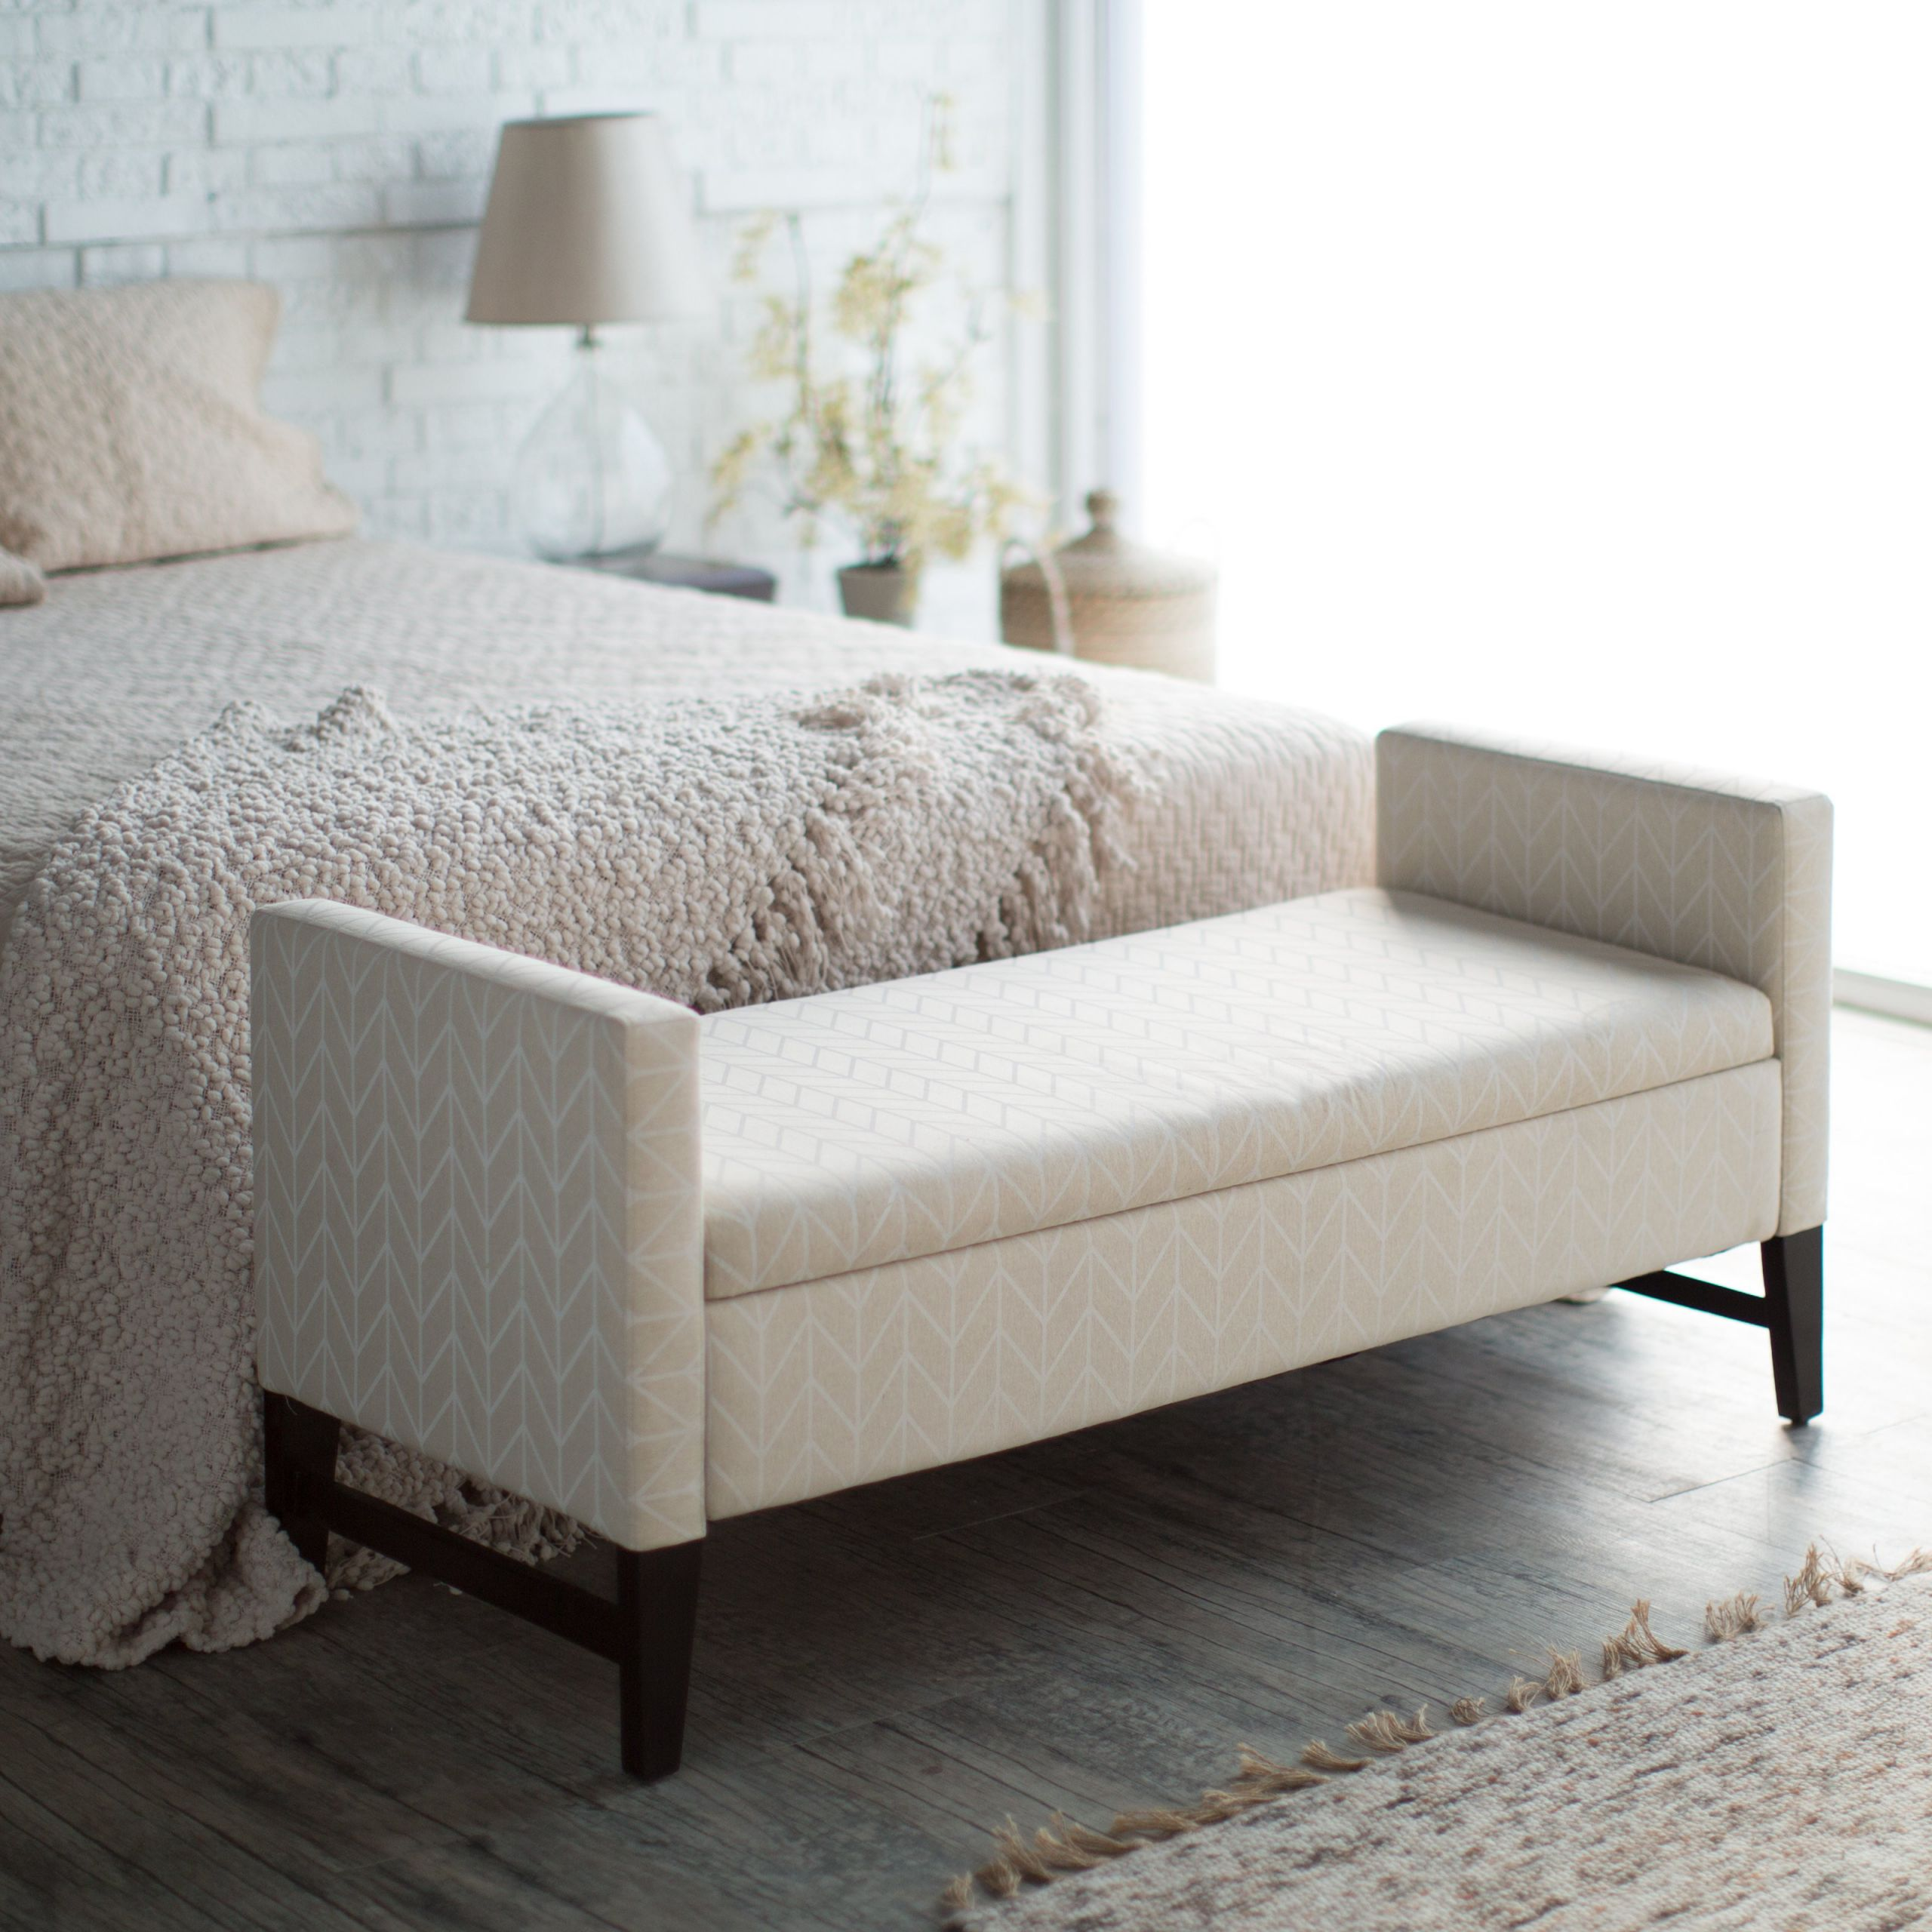 White Bedroom Storage Bench Elegant Upholstered Bench with Storage – Homesfeed